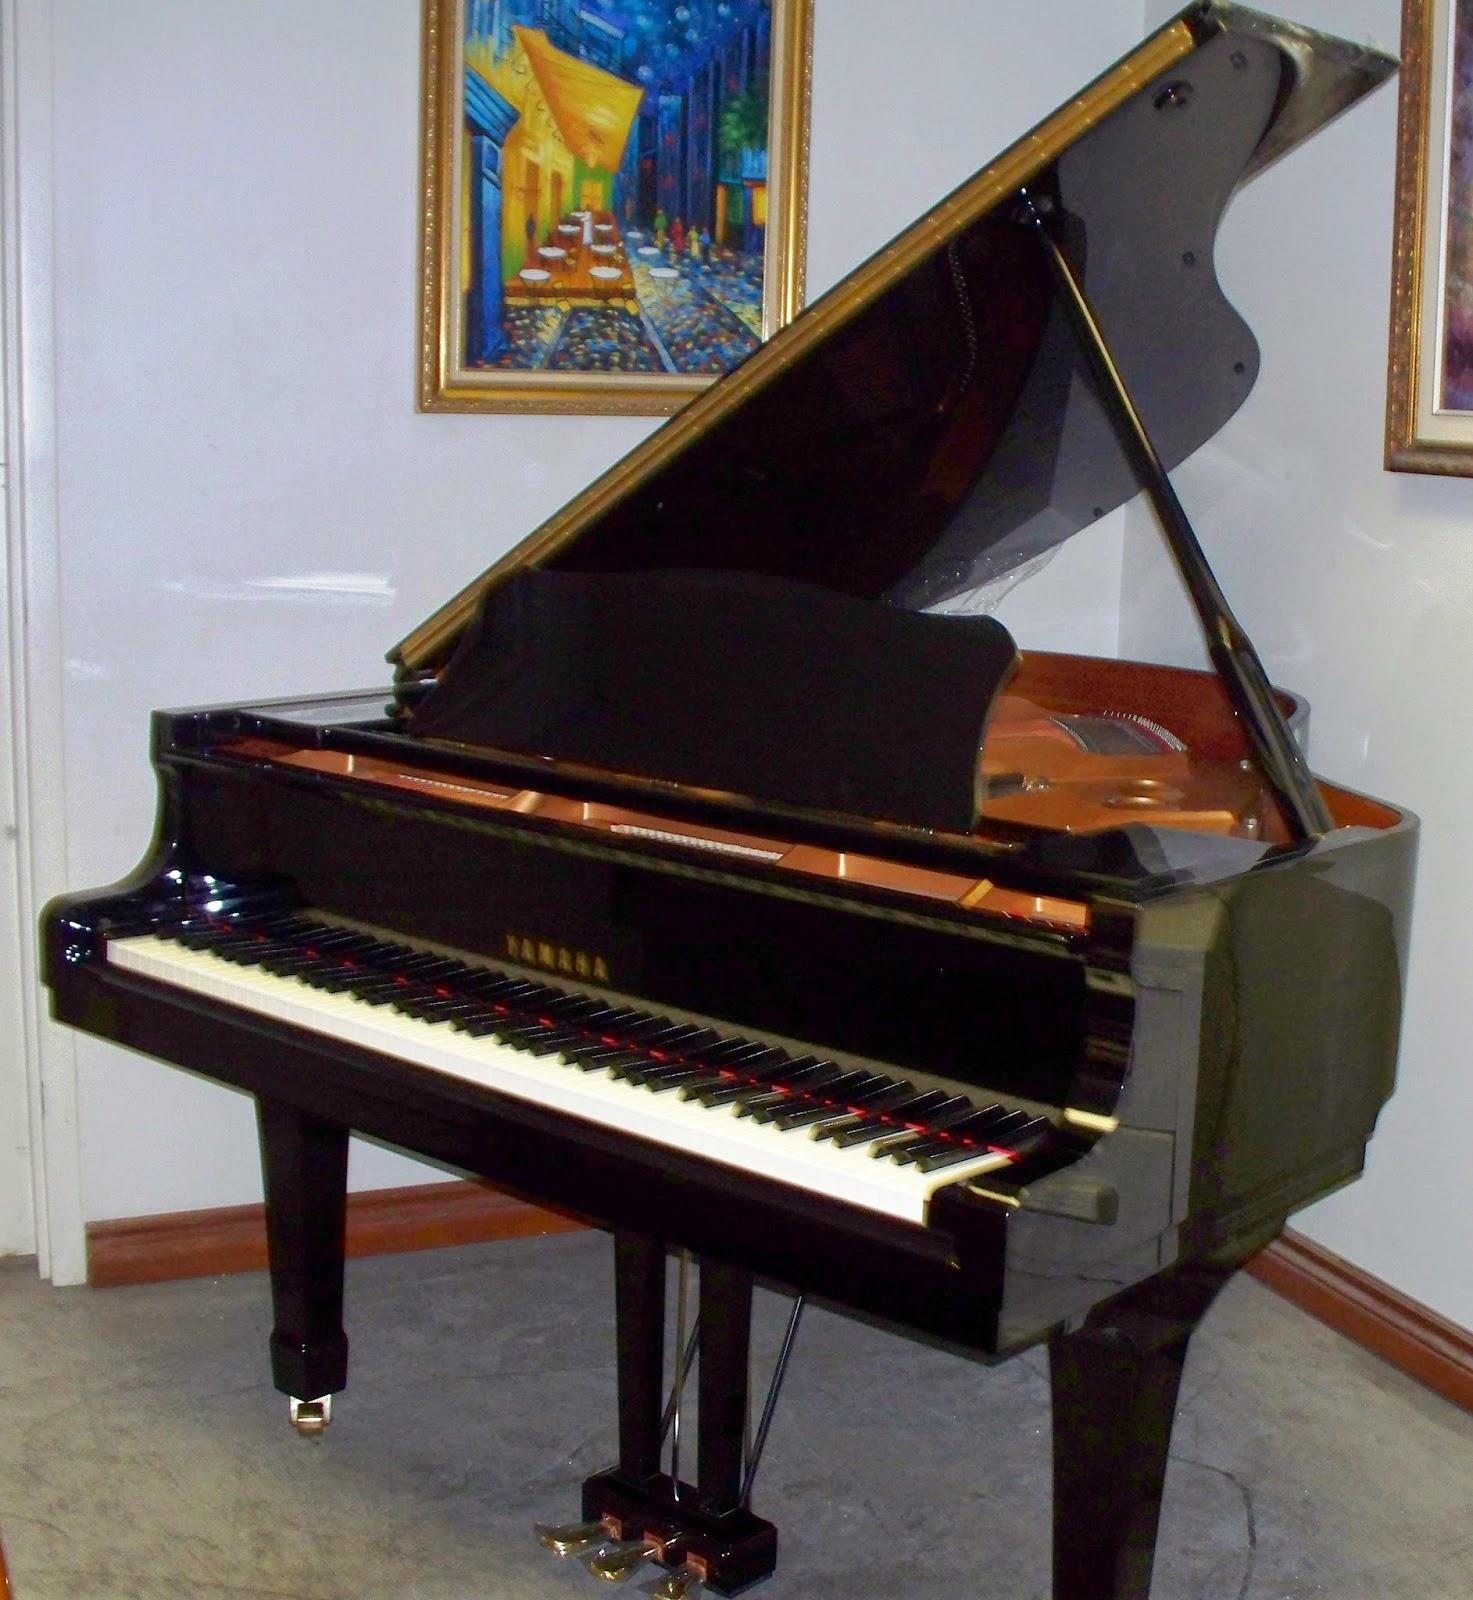 Used piano sale in toronto area yamaha g2 grand piano sold for Yamaha digital piano philippines